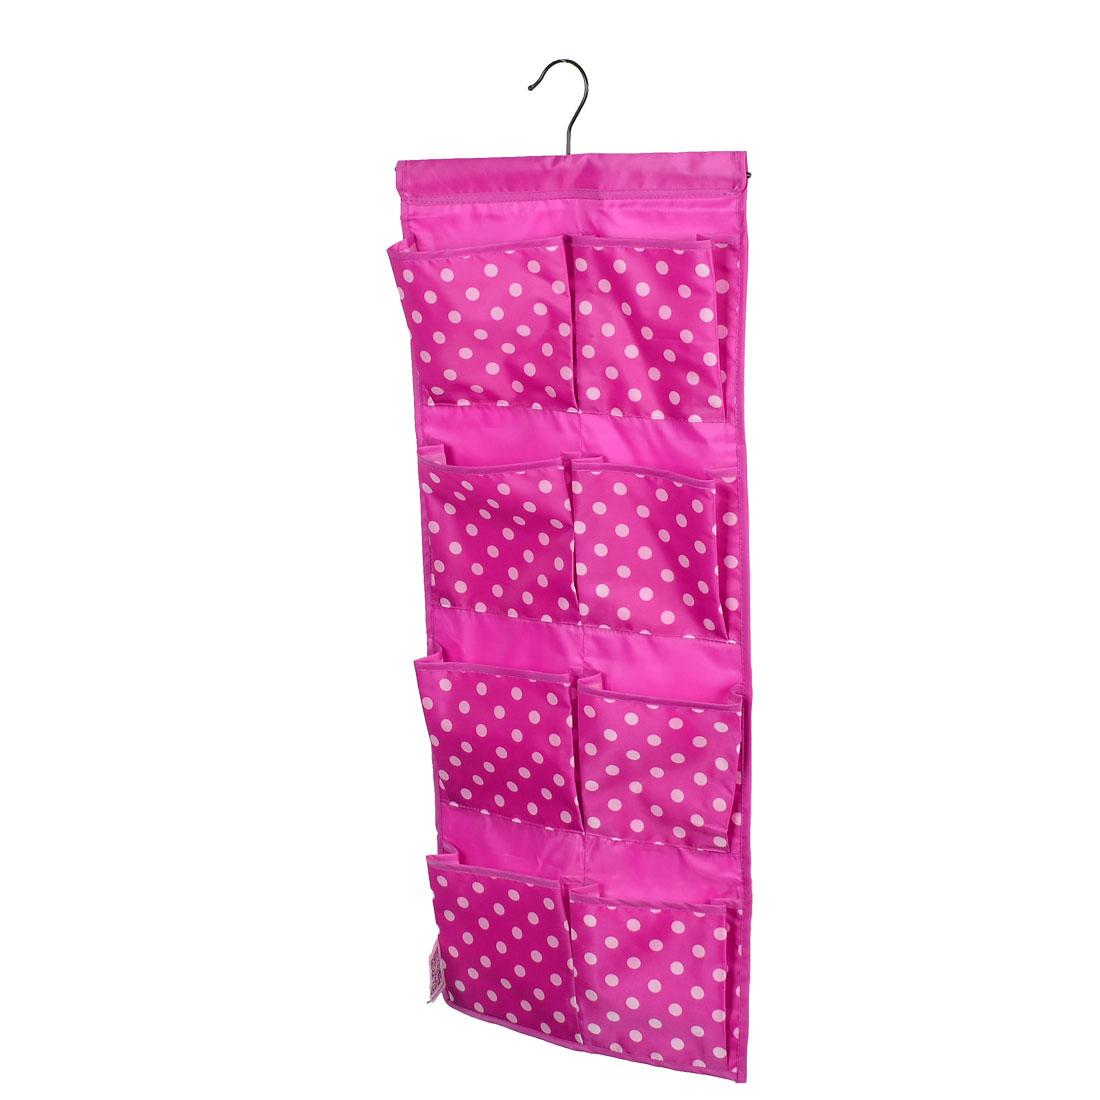 Dots Patten Wall Door Closet 8 Pockets Hanging Storage Bag Case Fuchsia